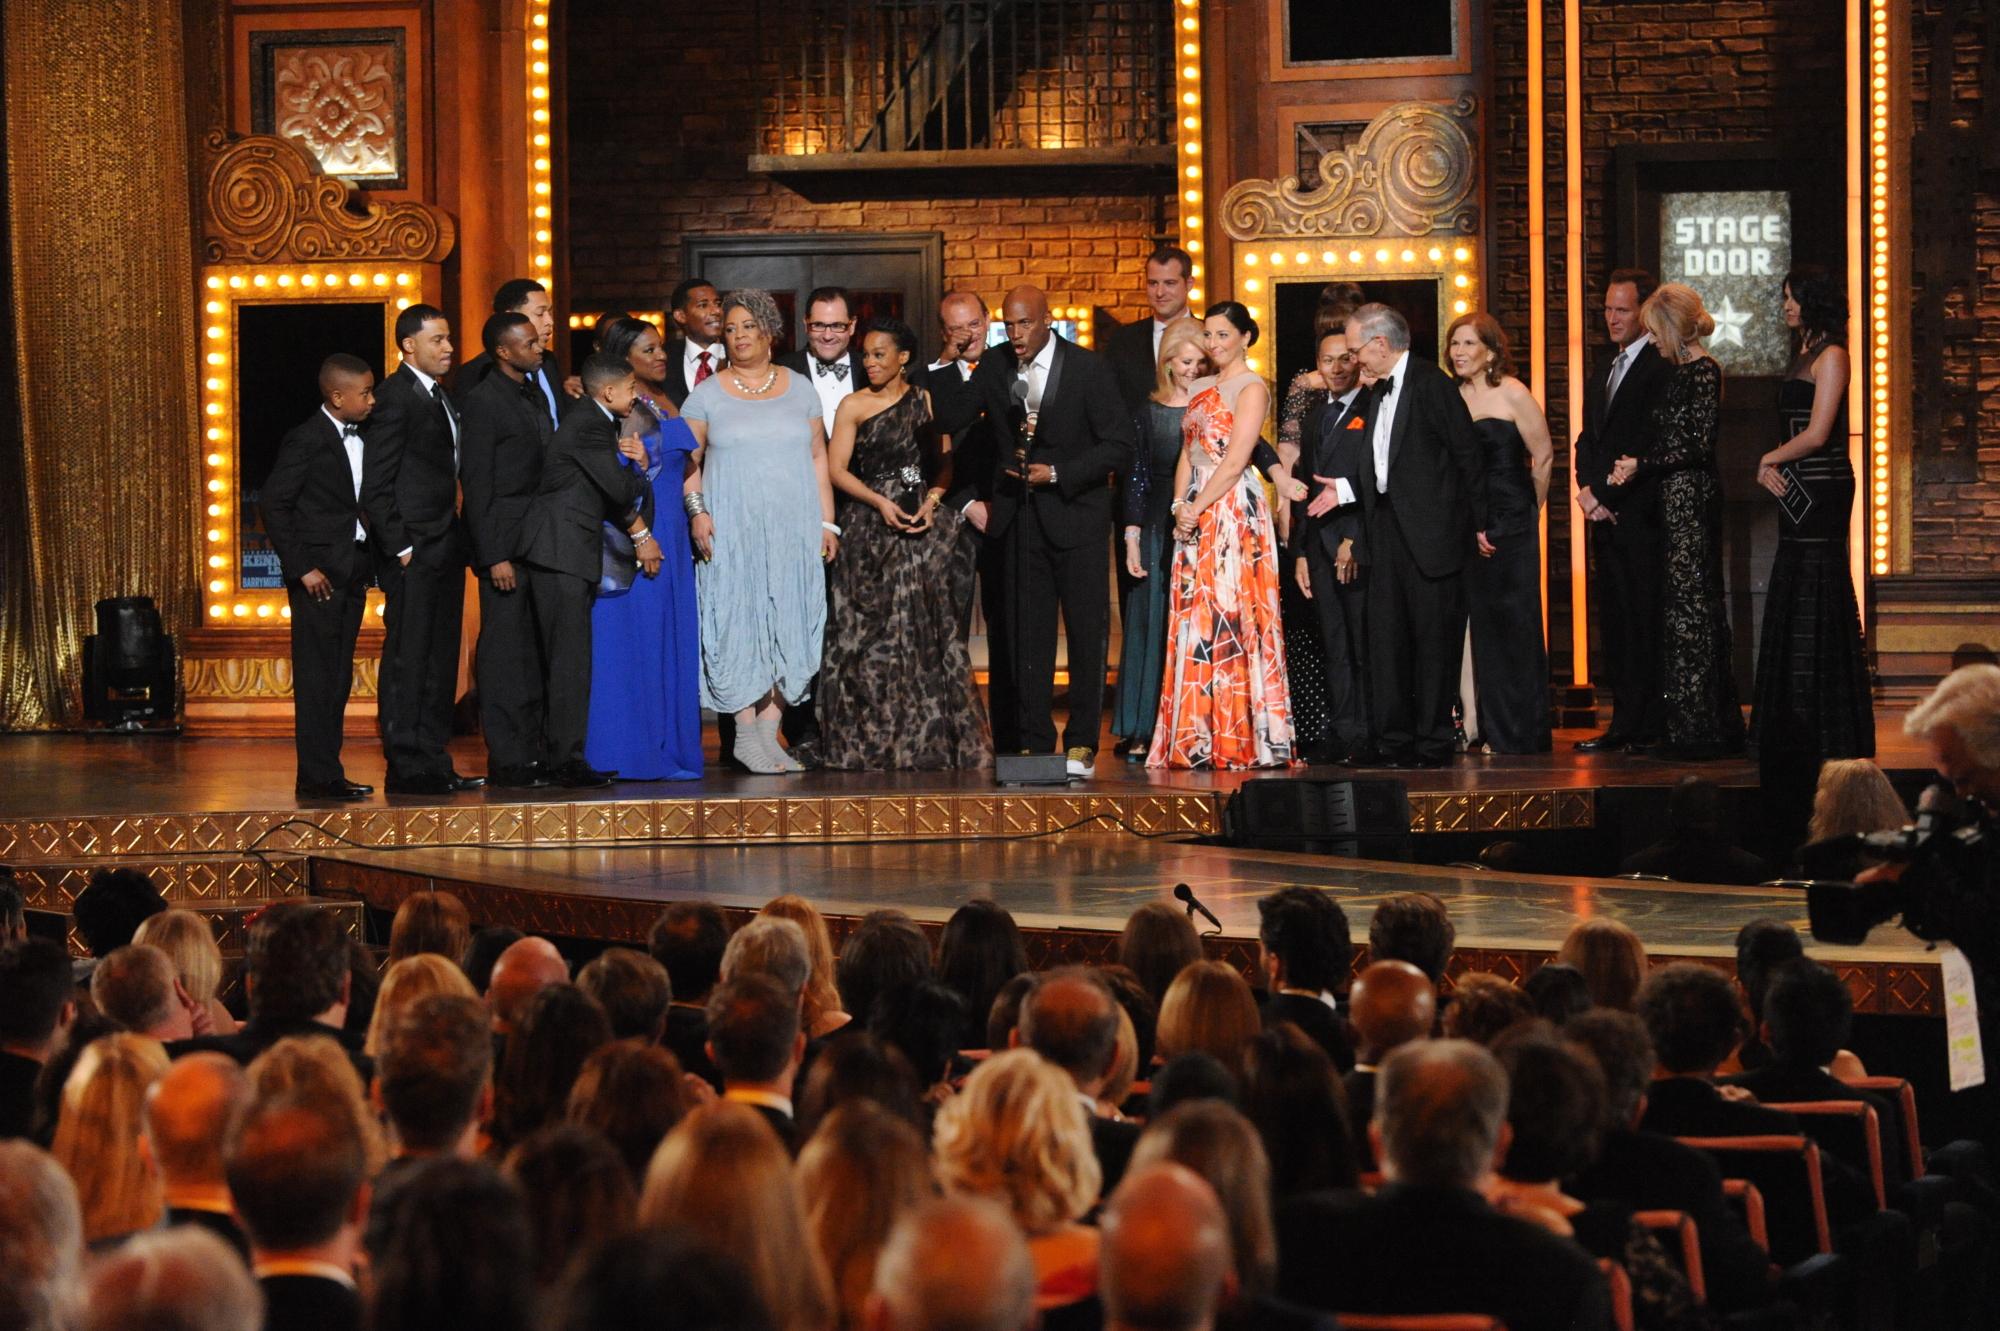 Winner Best Revival of a Play A Raisin in the Sun - 2014 Tony Awards